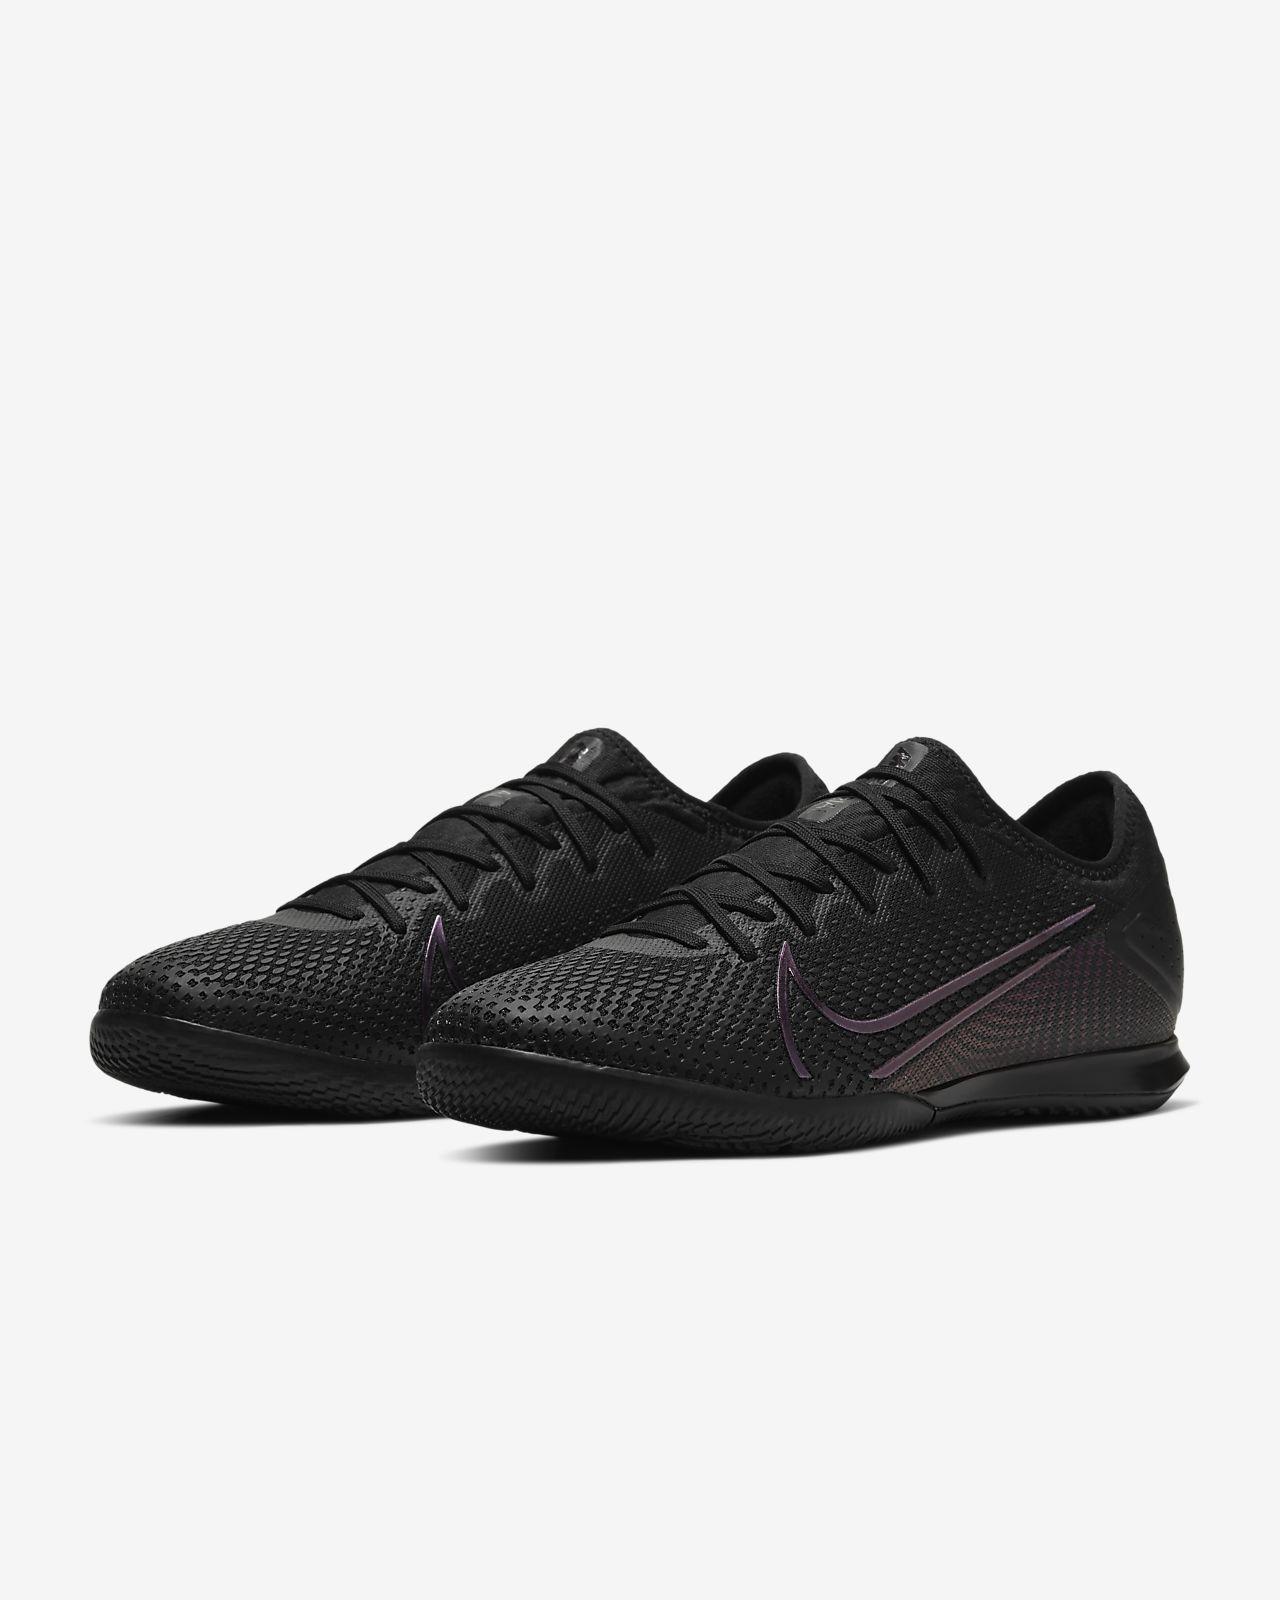 Sapatilhas Nike Mercurial Vapor 13 Pro IC